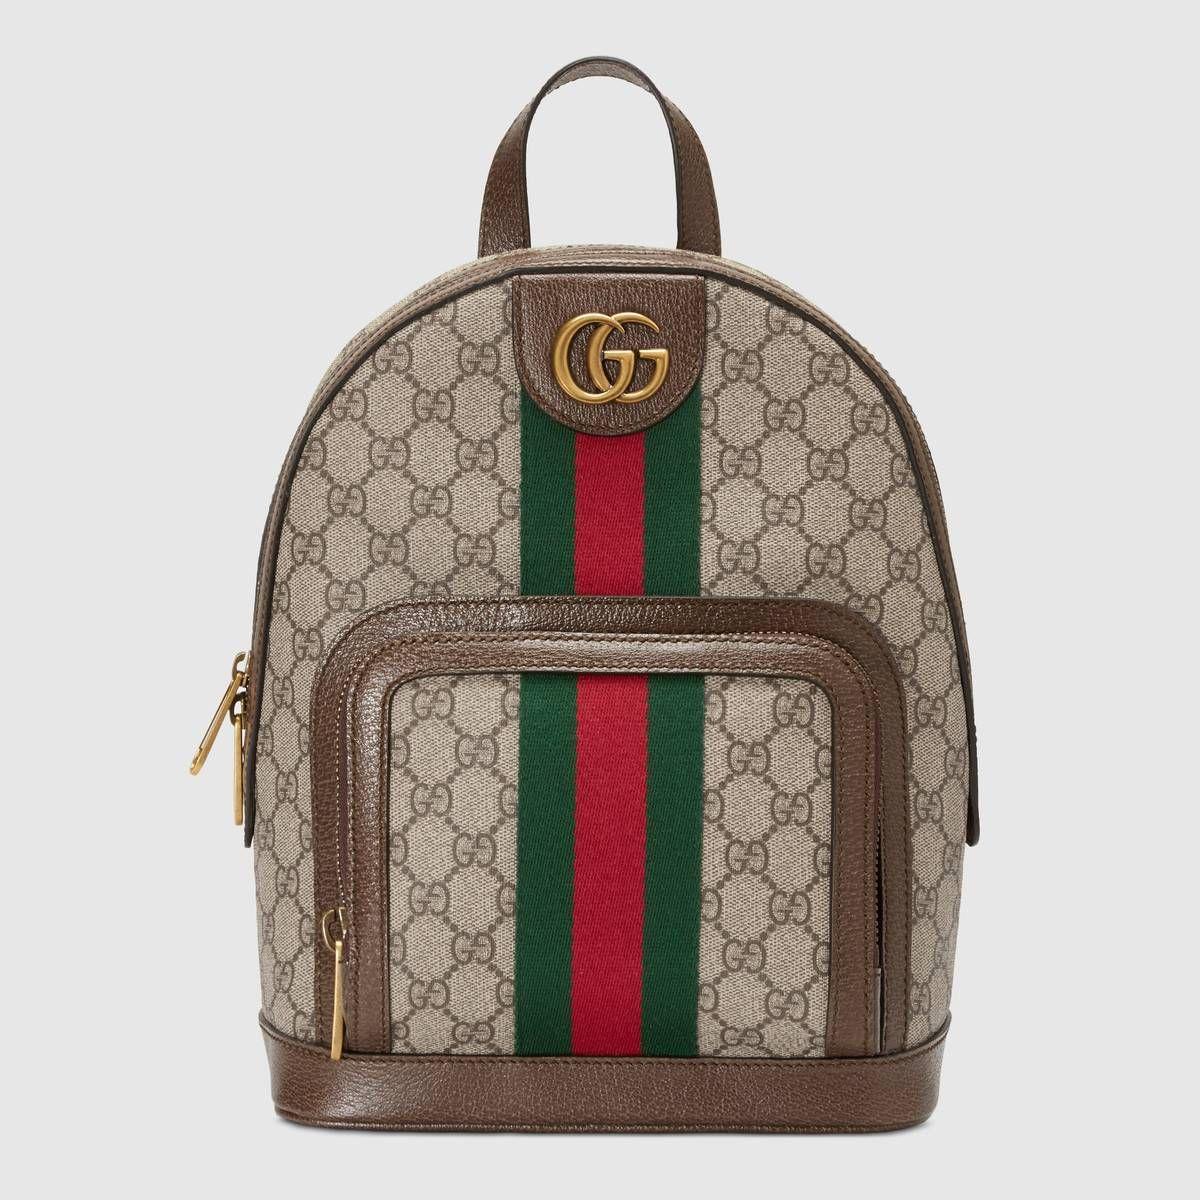 fb5abcdbe2993 Compra ahora Mochila Ophidia Pequeña con GG de Gucci.